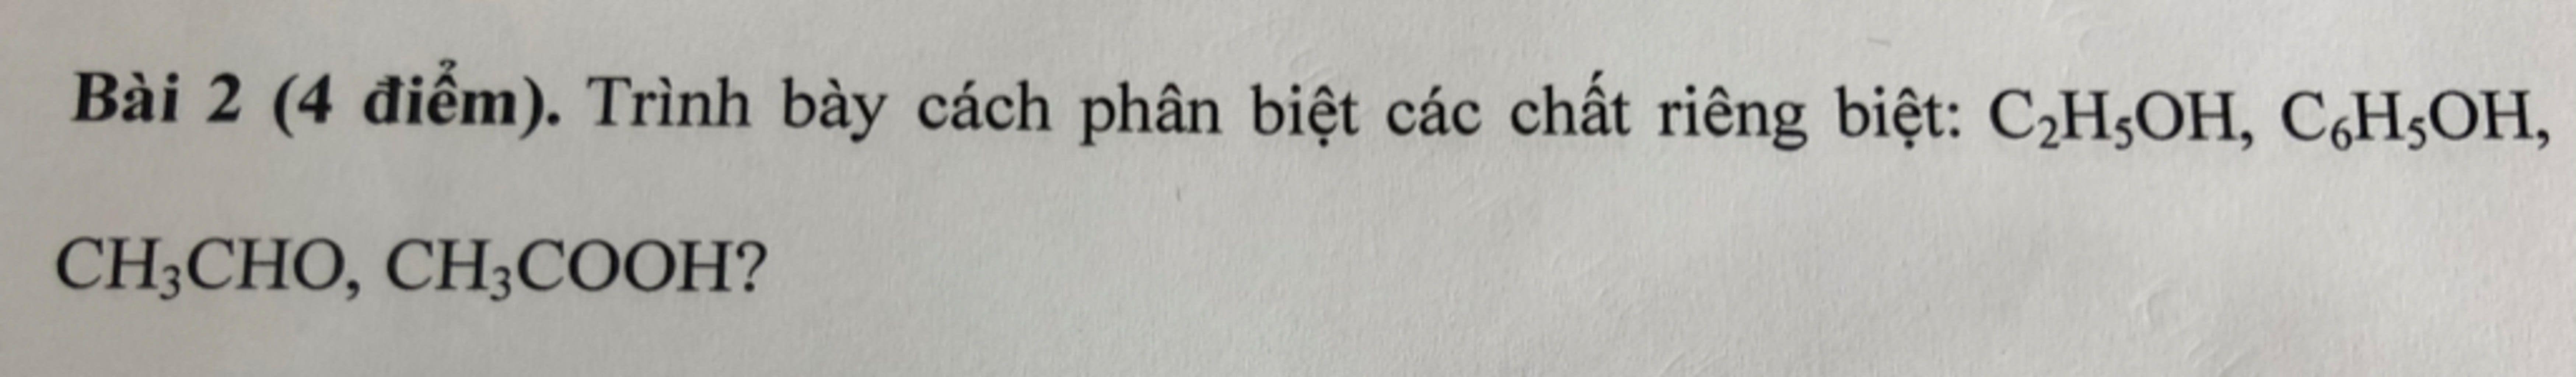 trinh-bay-cach-phan-biet-cac-chat-rieng-biet-c2h5oh-c6h5oh-ch3cho-ch3cooh